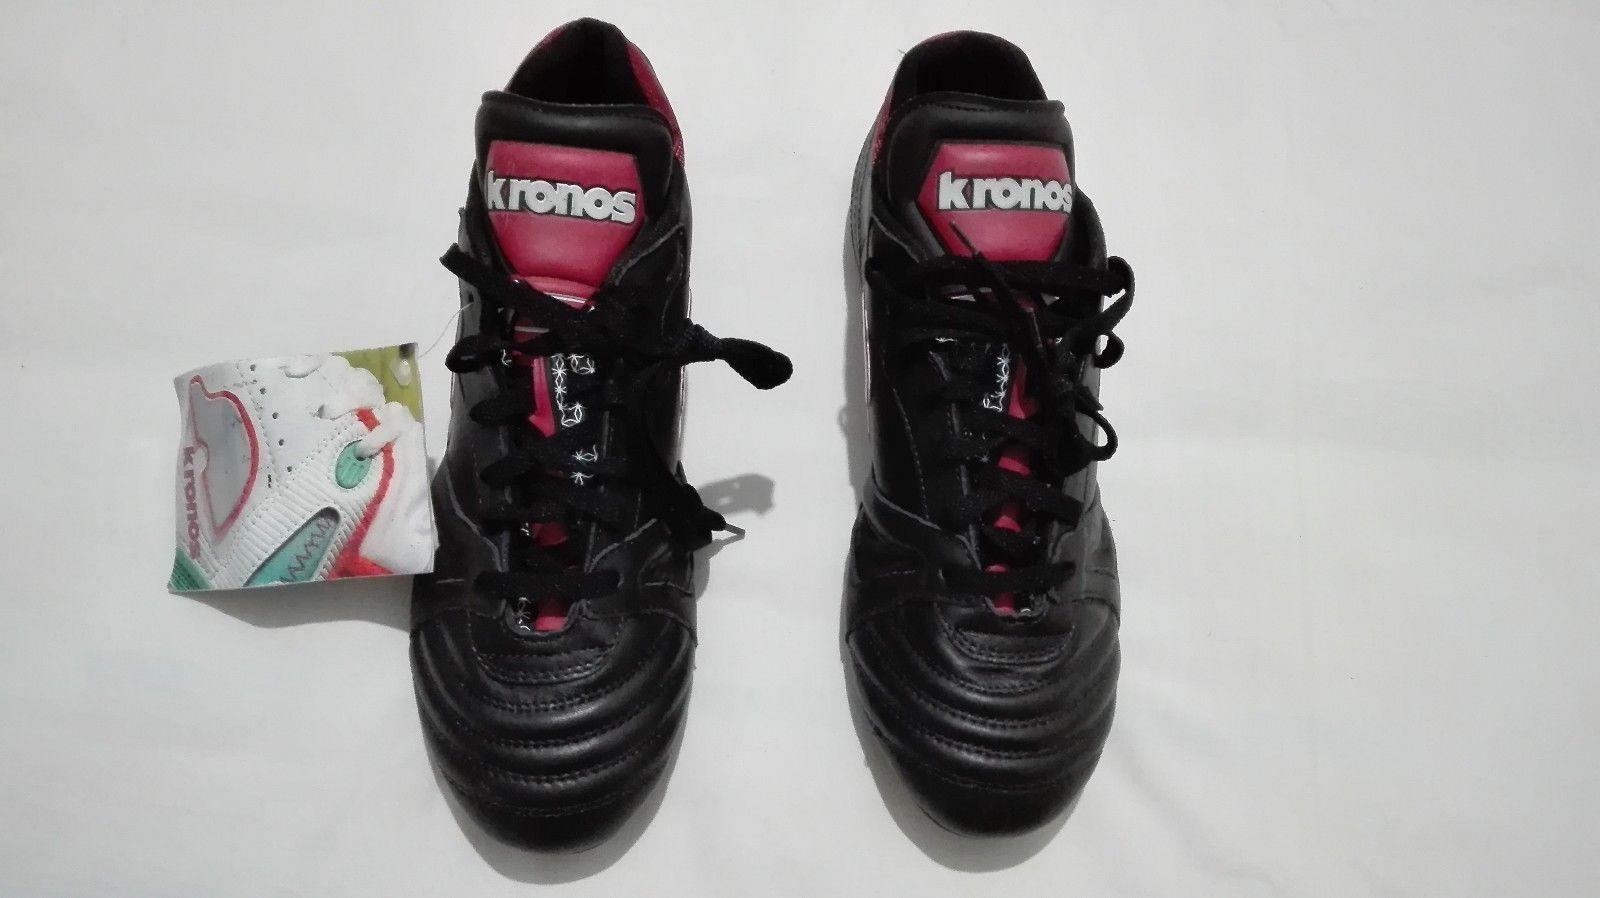 KRONOS Roberto Mancini signed 90's vintage soccer boots